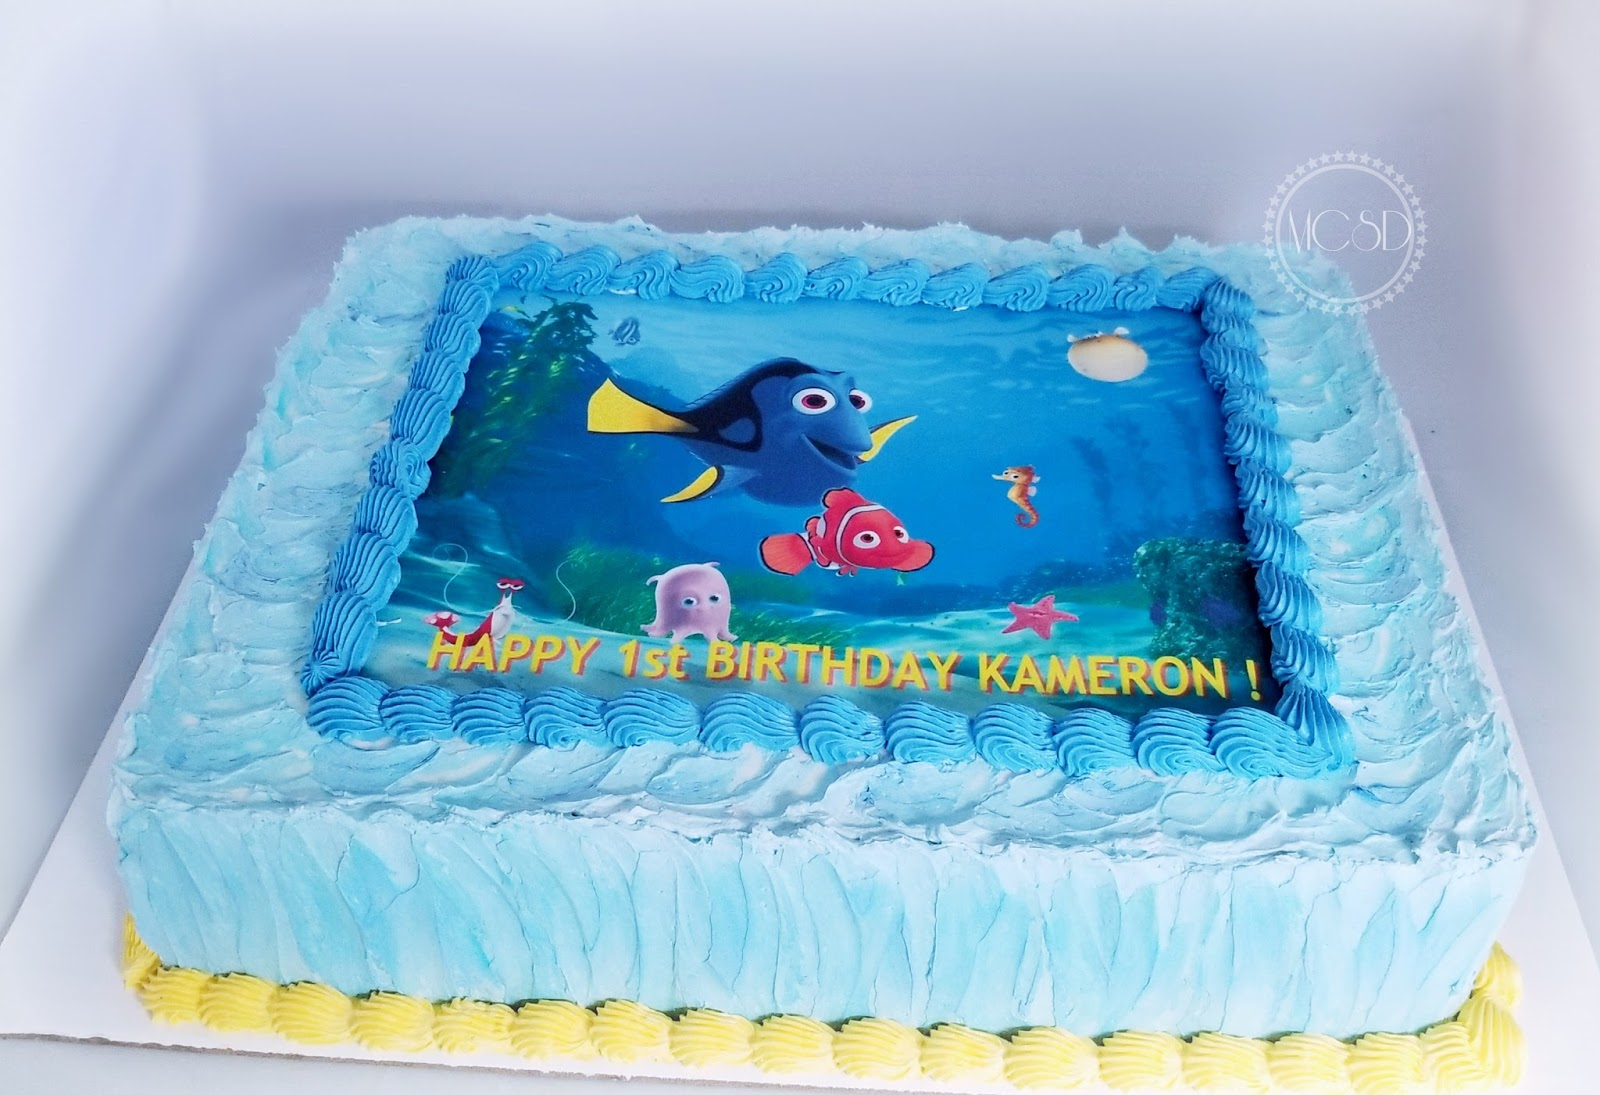 My Cake Sweet Dreams Finding Nemo 1st Birthday Cake Smash Cake